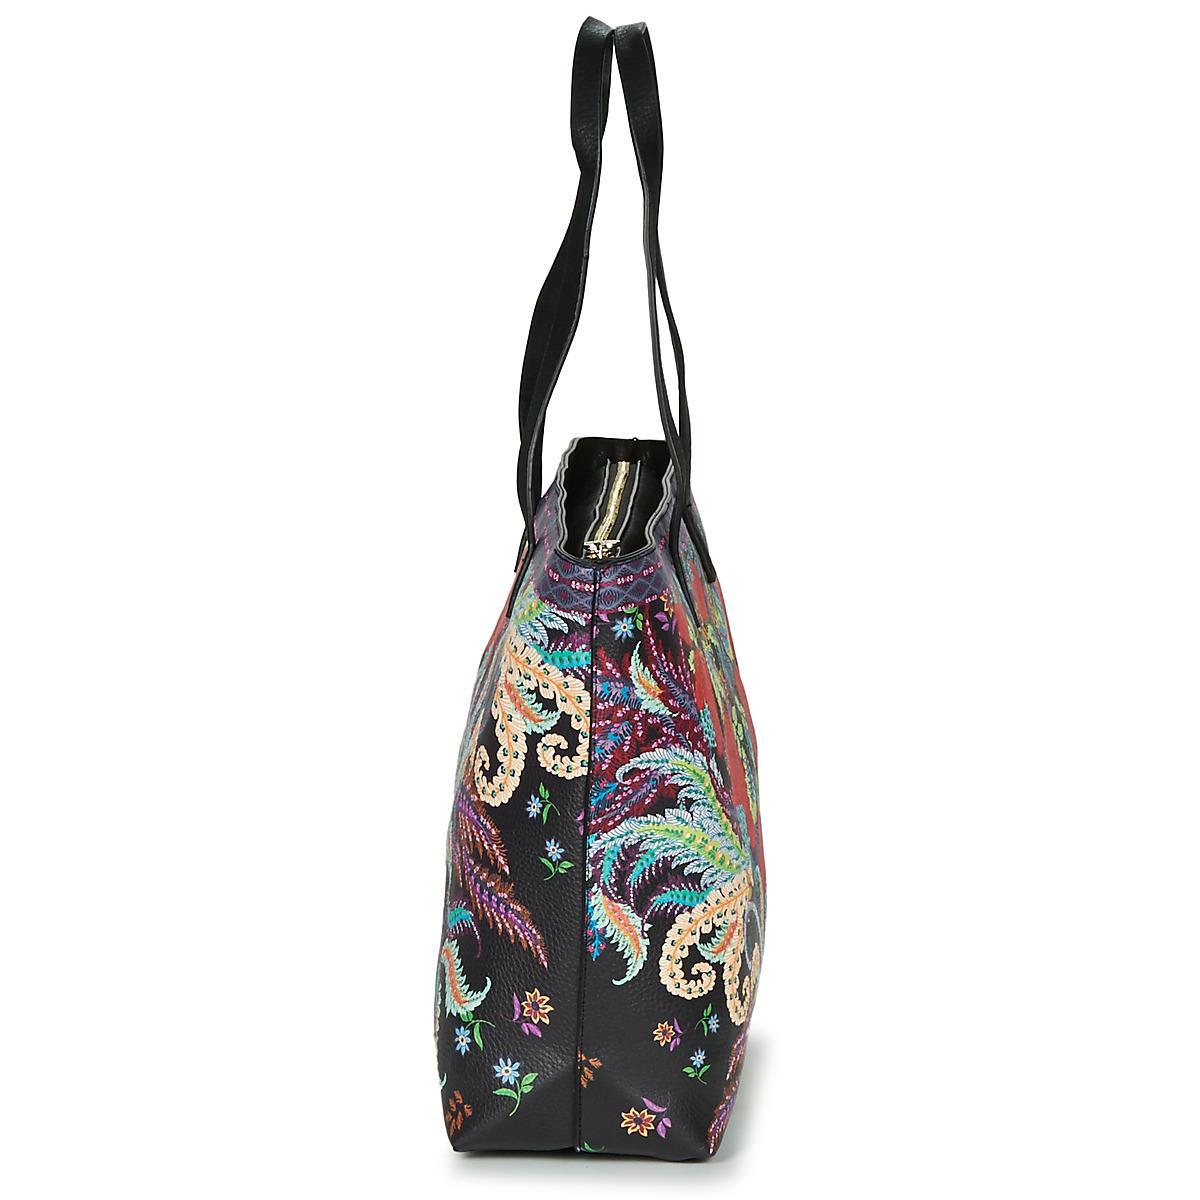 Desigual - Multicolor Feather Redmond Women s Shopper Bag In Multicolour  for Men - Lyst. View fullscreen 34a11c32be2dc